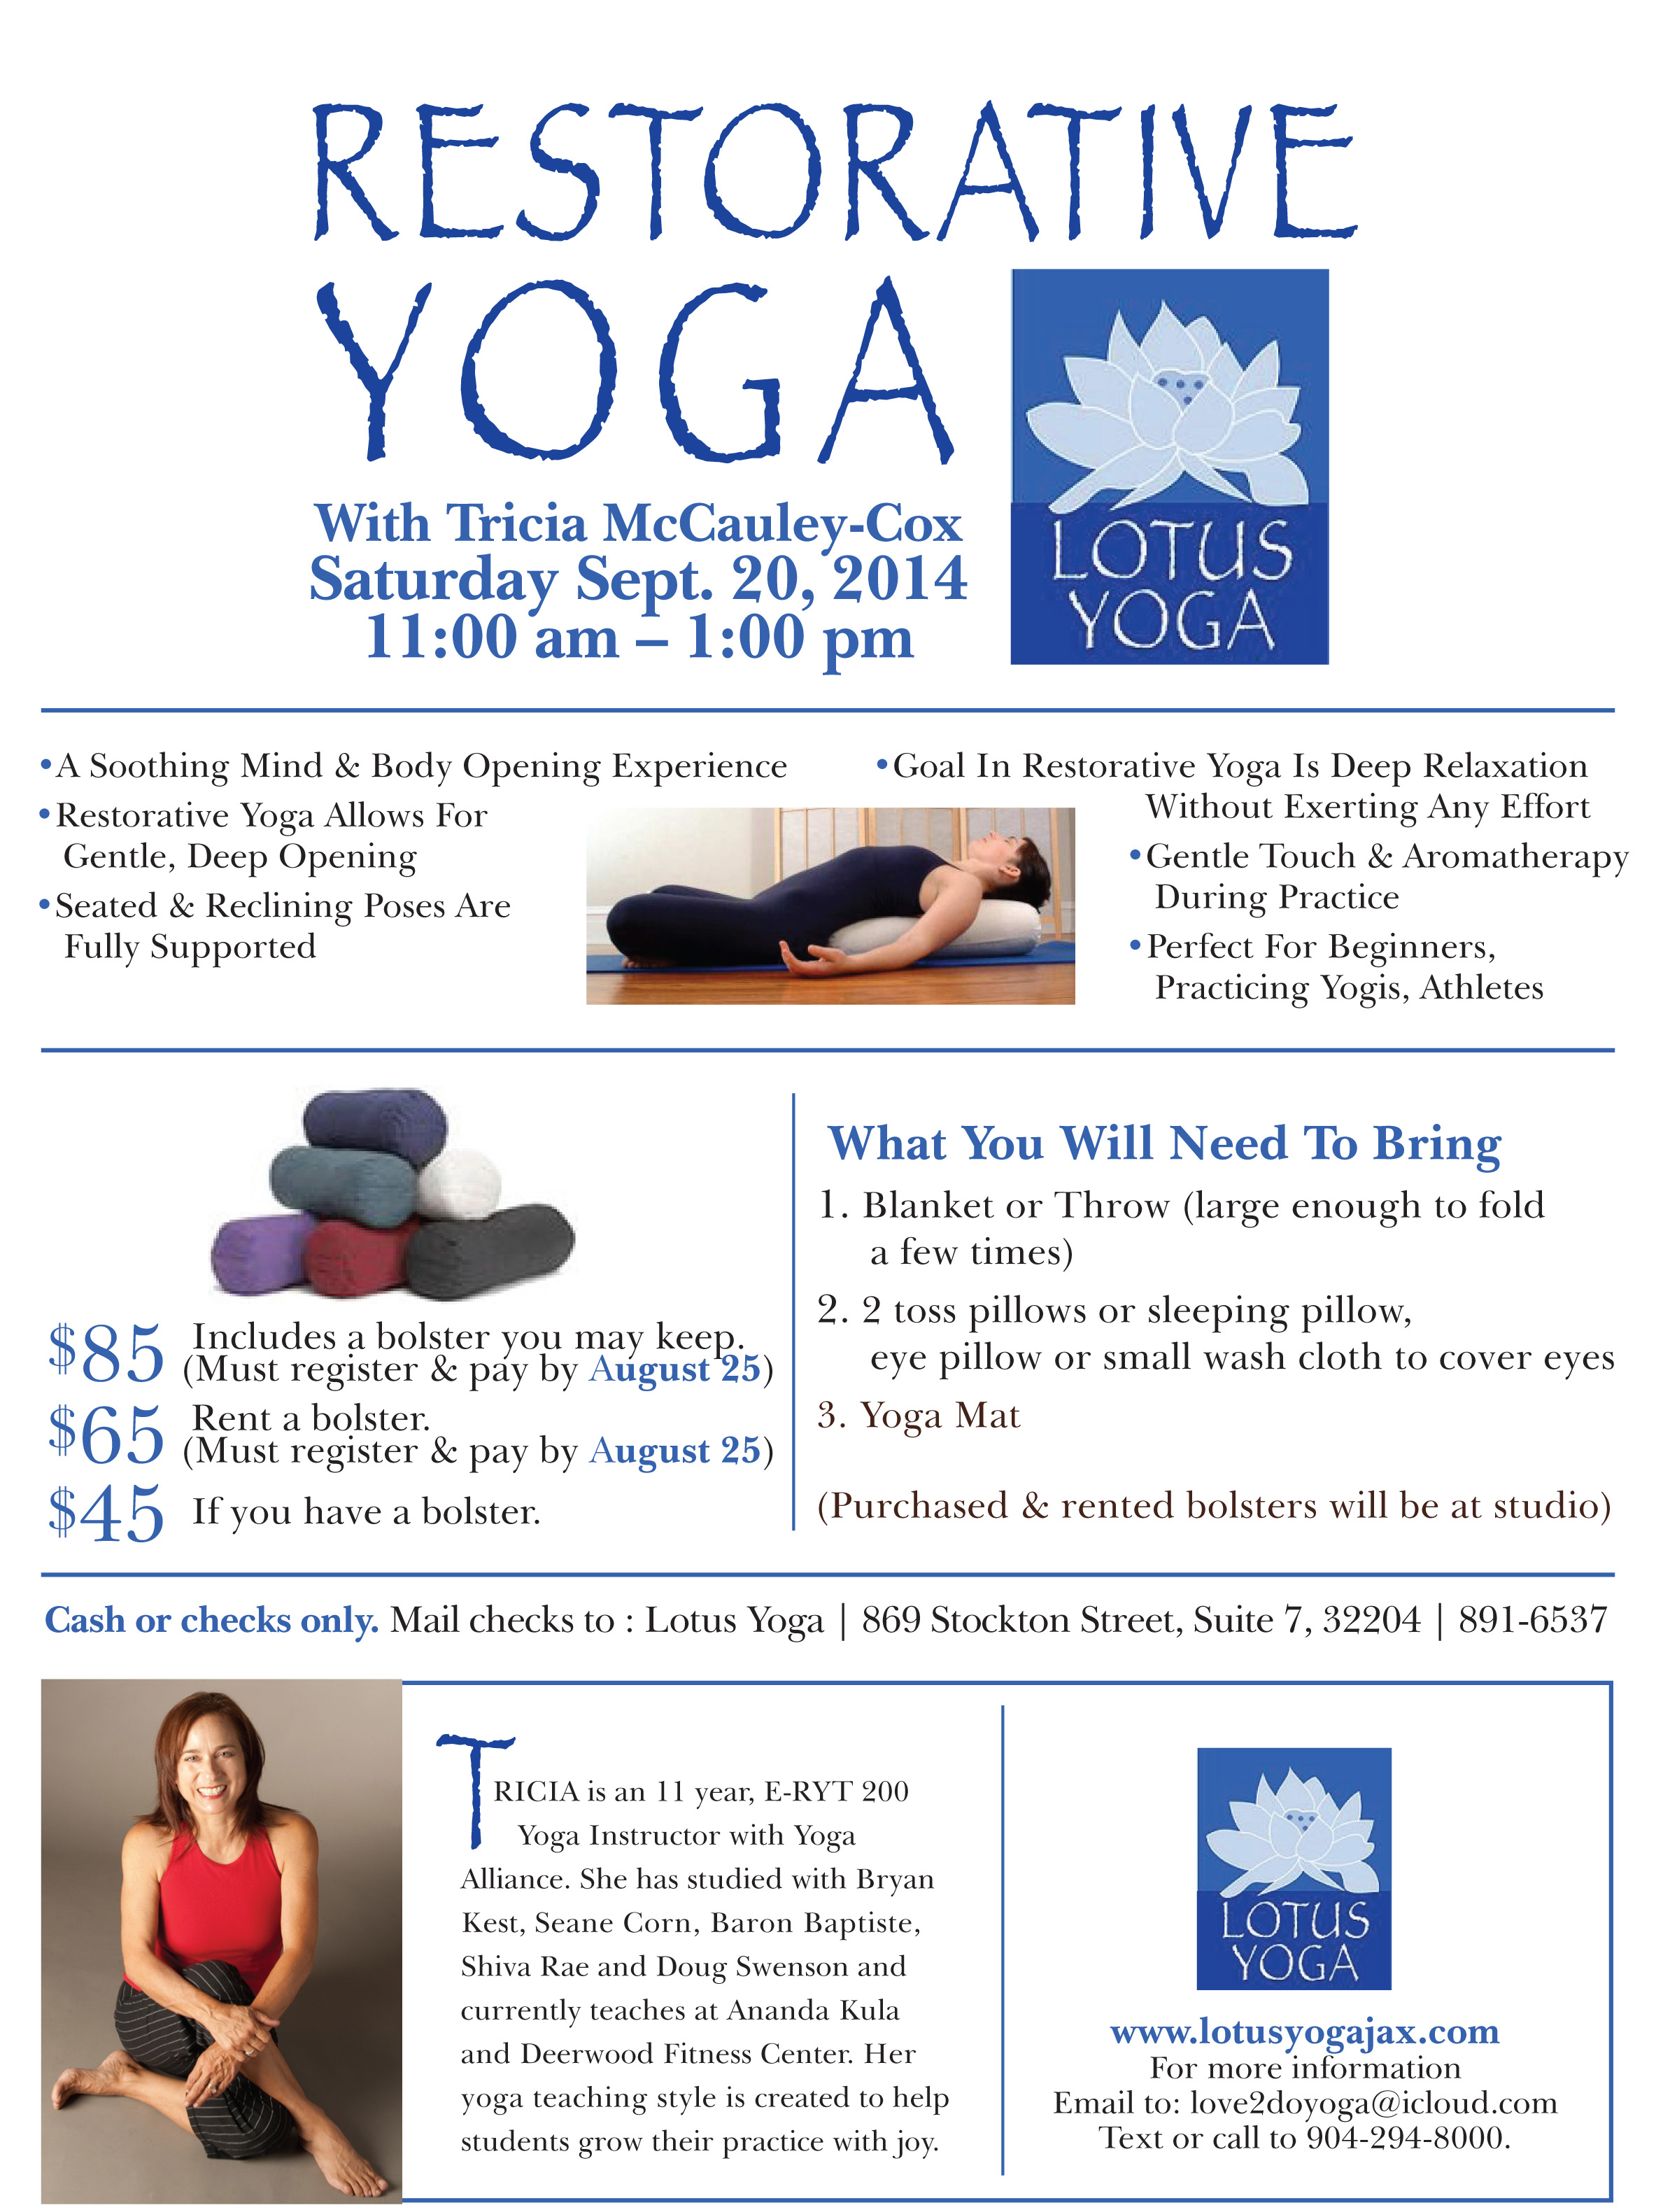 Restorative Yoga Workshop with Tricia McCauley-Cox  sc 1 st  Lotus Yoga & Workshops u2014 Lotus Yoga islam-shia.org